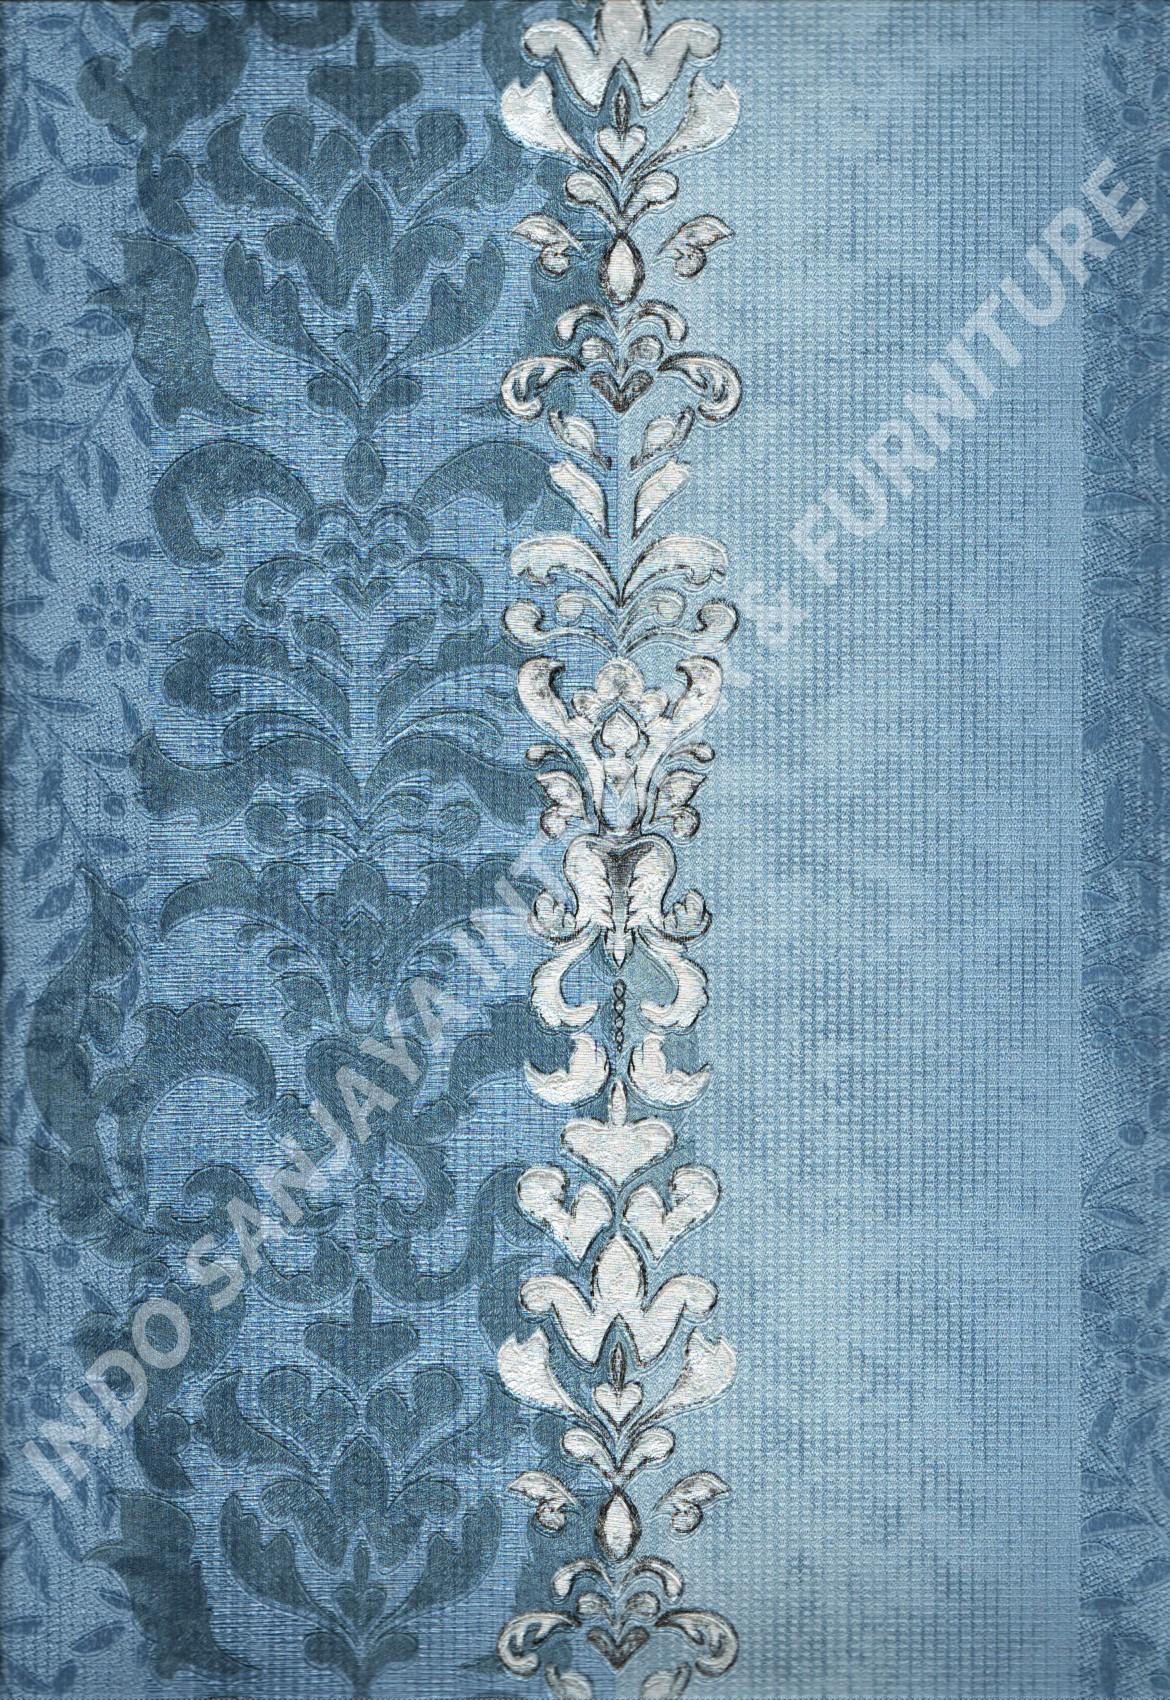 wallpaper   Wallpaper Klasik Batik (Damask) DL11907:DL11907 corak  warna